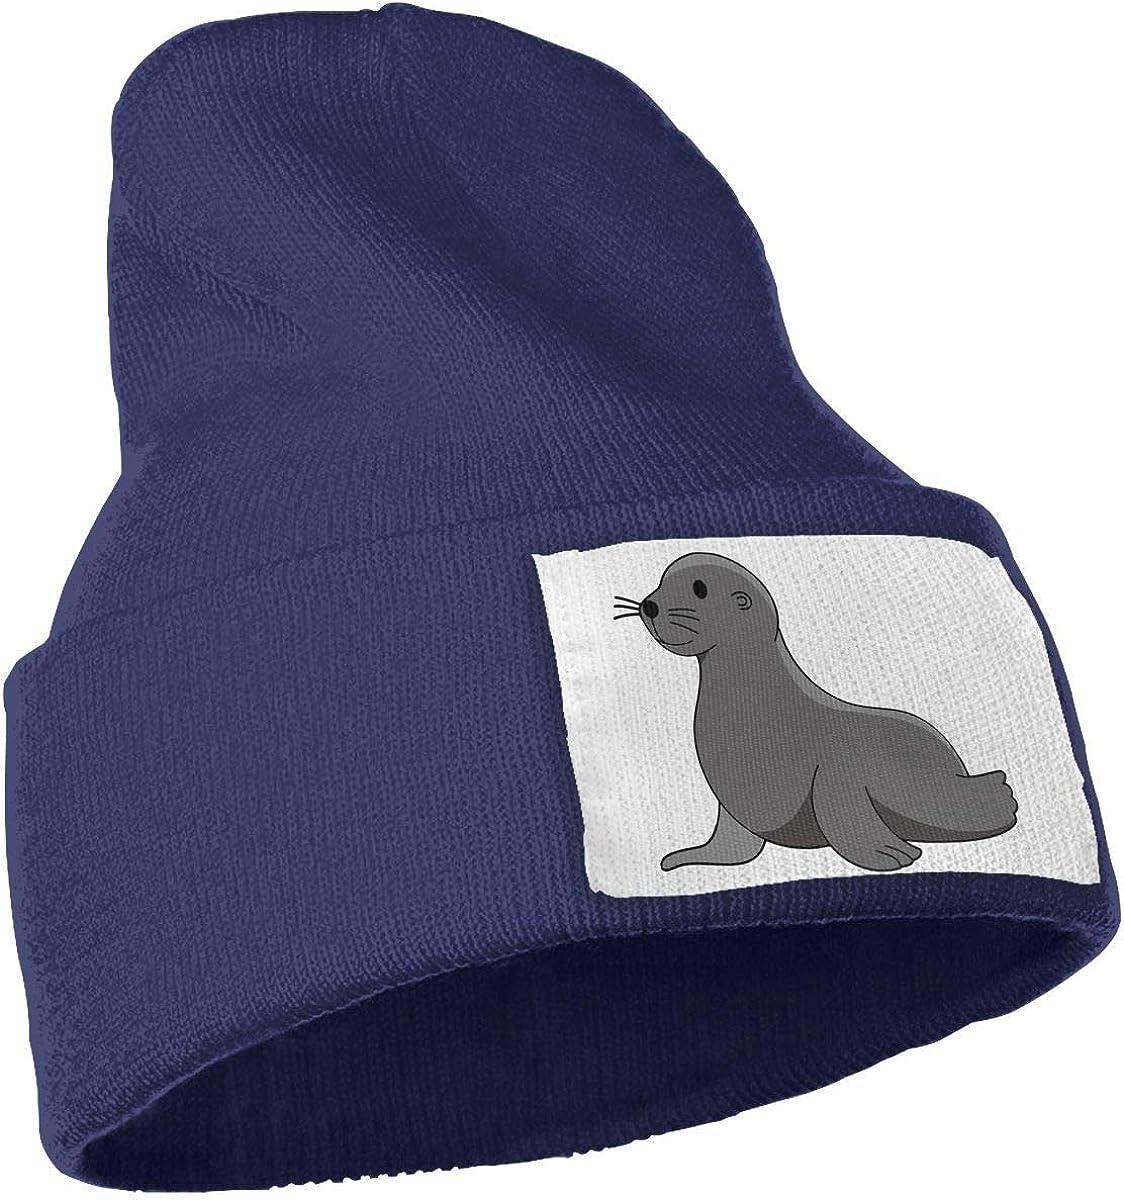 TAOMAP89 Unisex Baby Sea Lion Elephant Seal Skull Caps Men /& Women Winter Warm Stretchy Knitting Beanie Hats